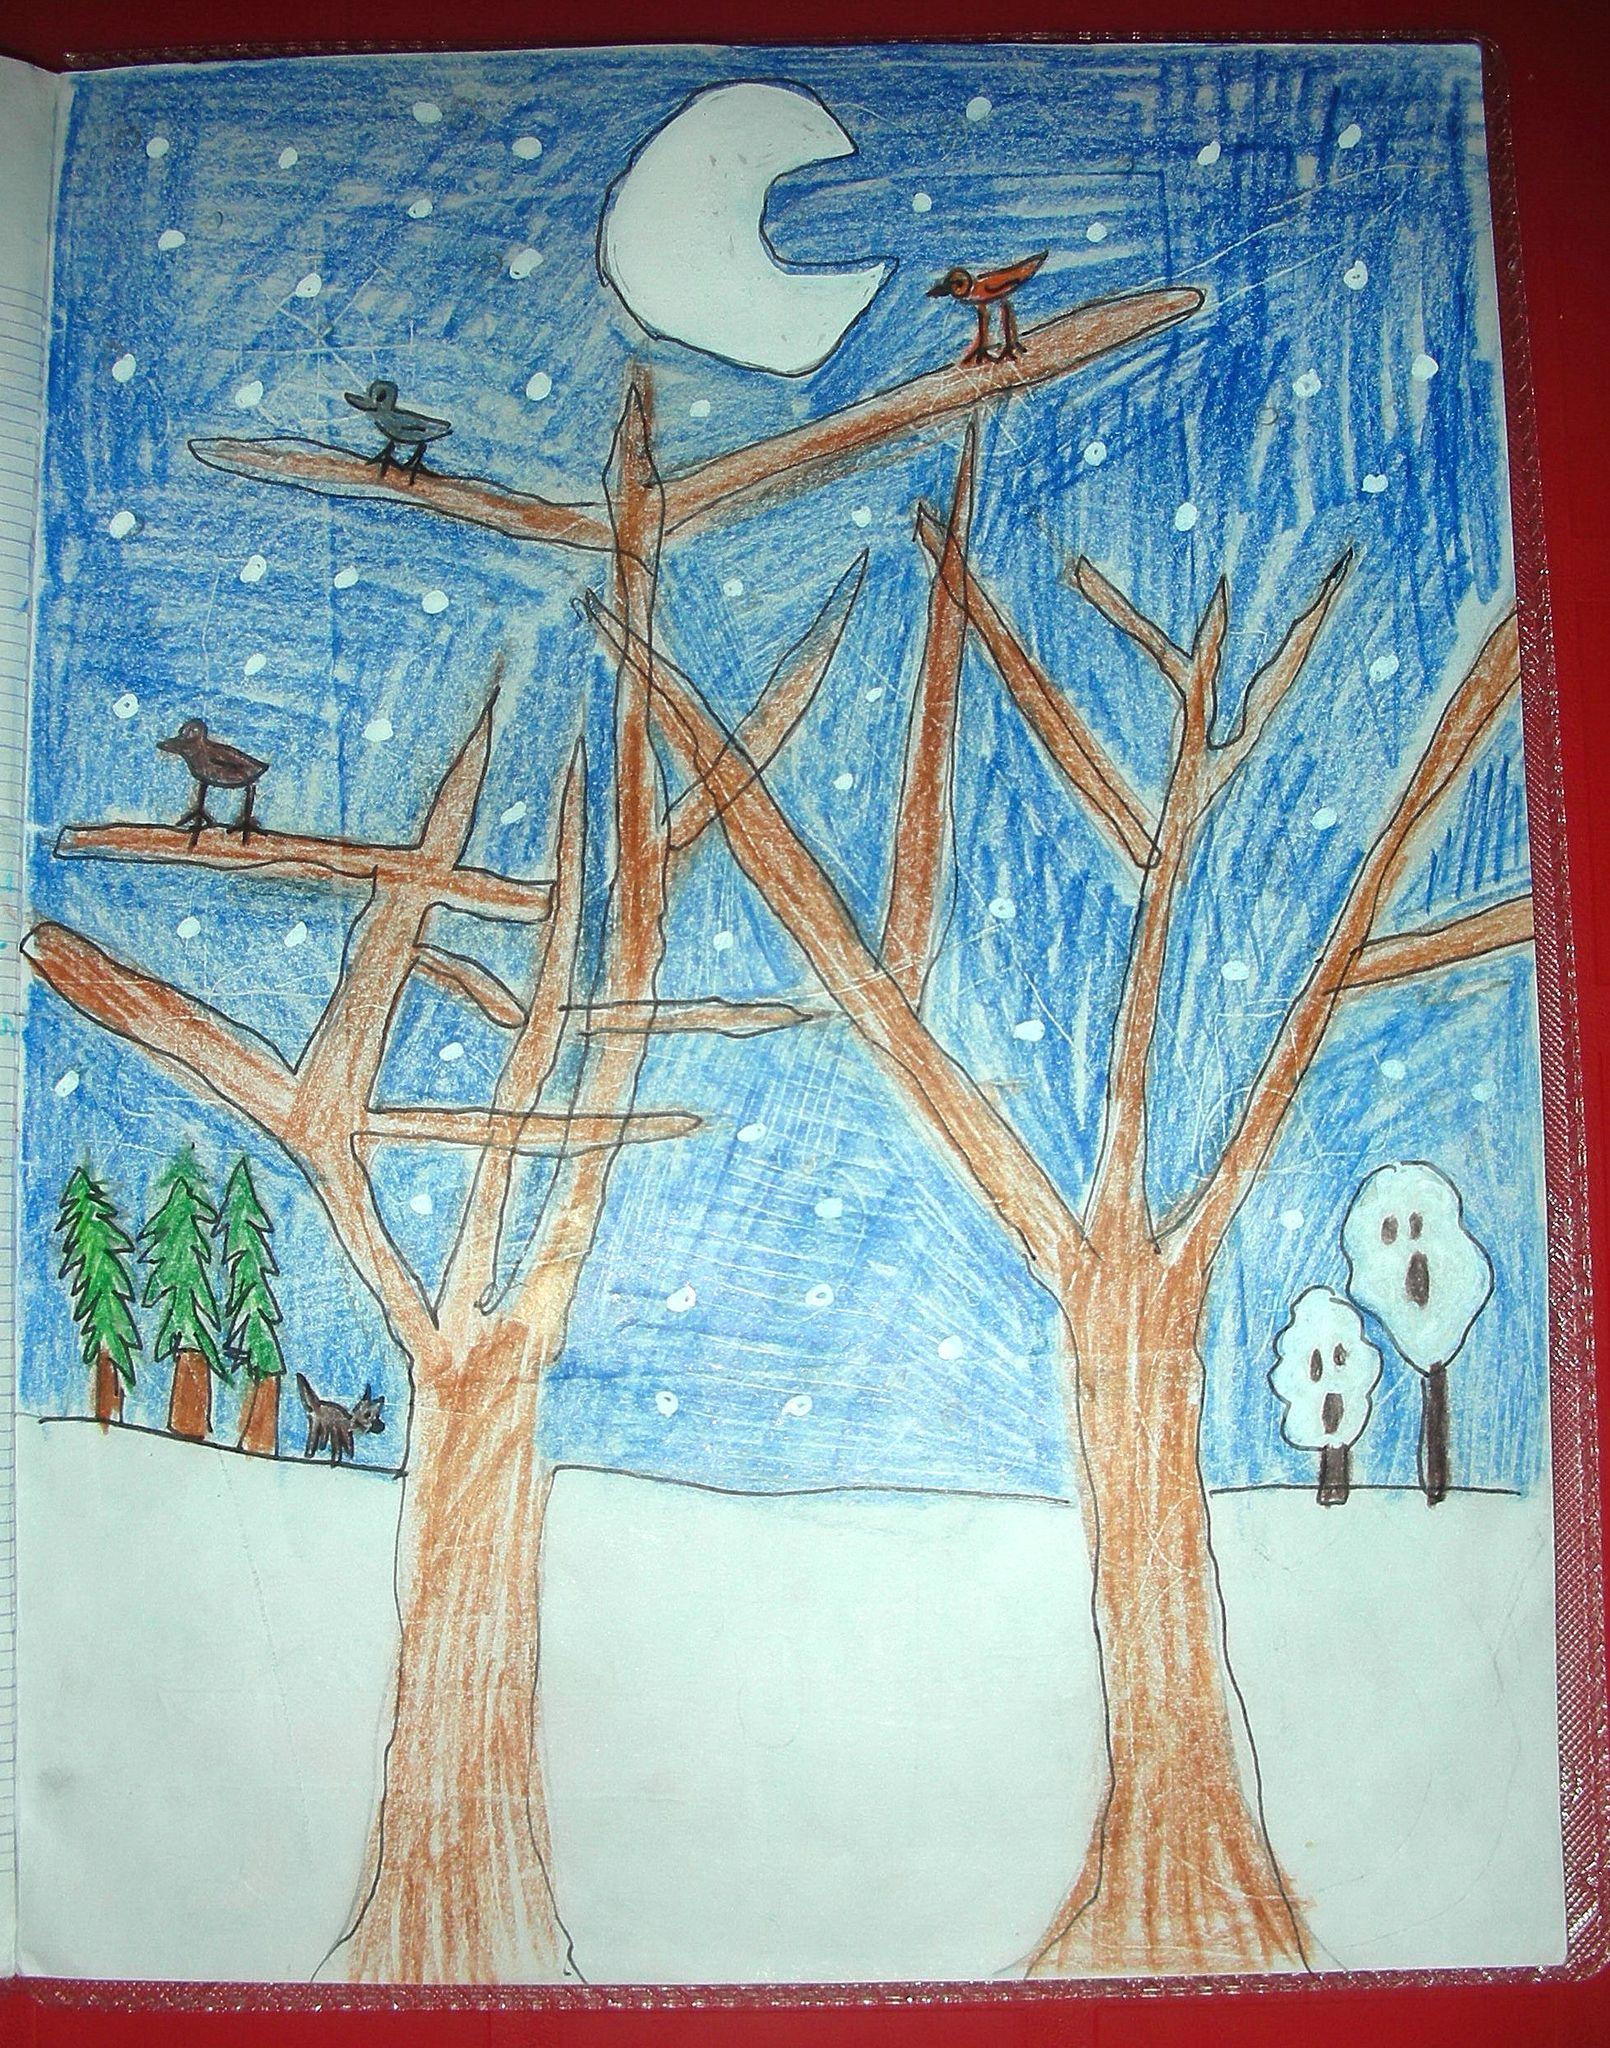 poesie nuit de neige illustration